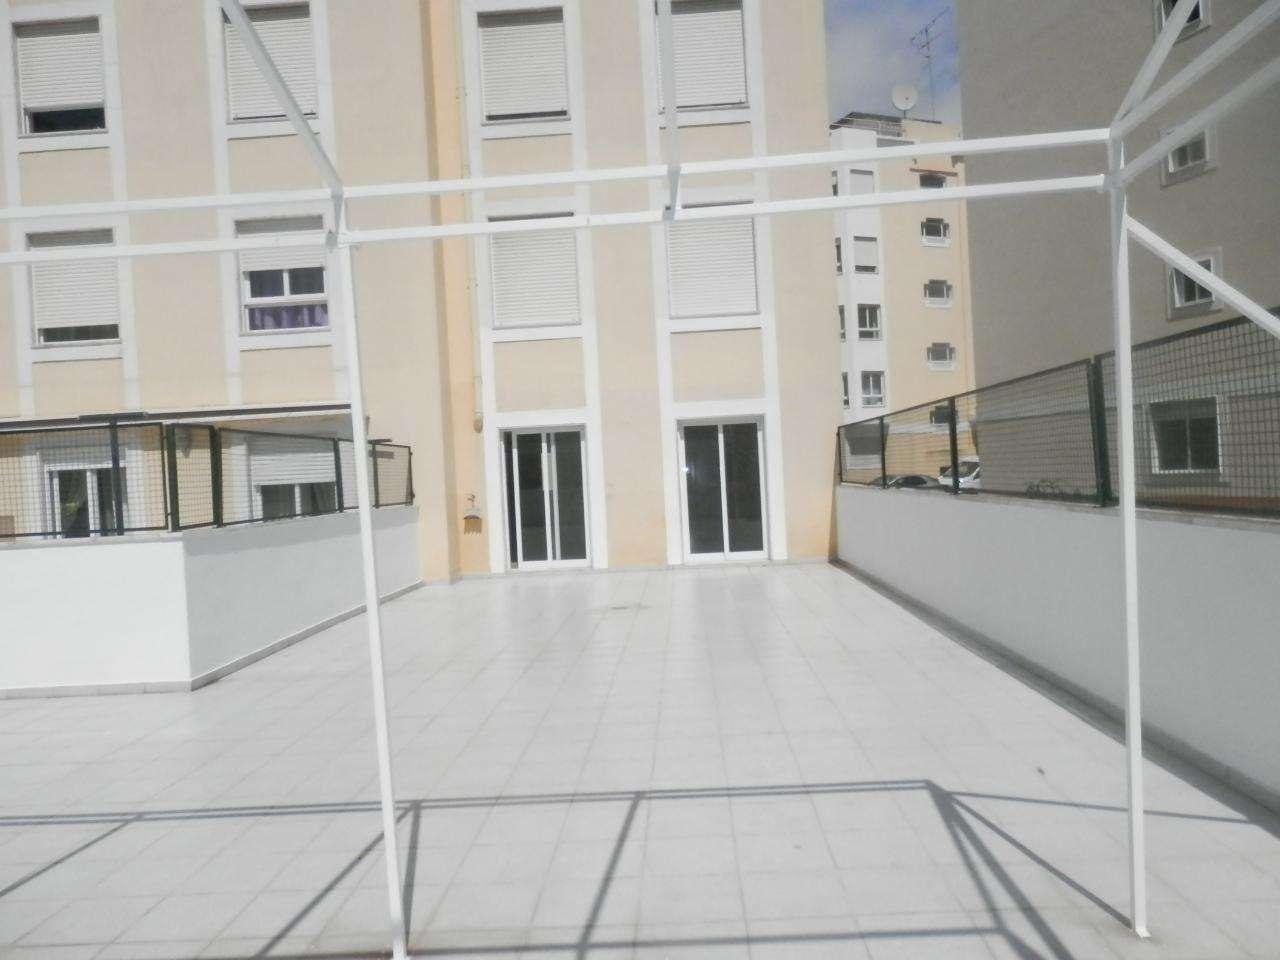 Apartamento para comprar, Rio de Mouro, Sintra, Lisboa - Foto 12